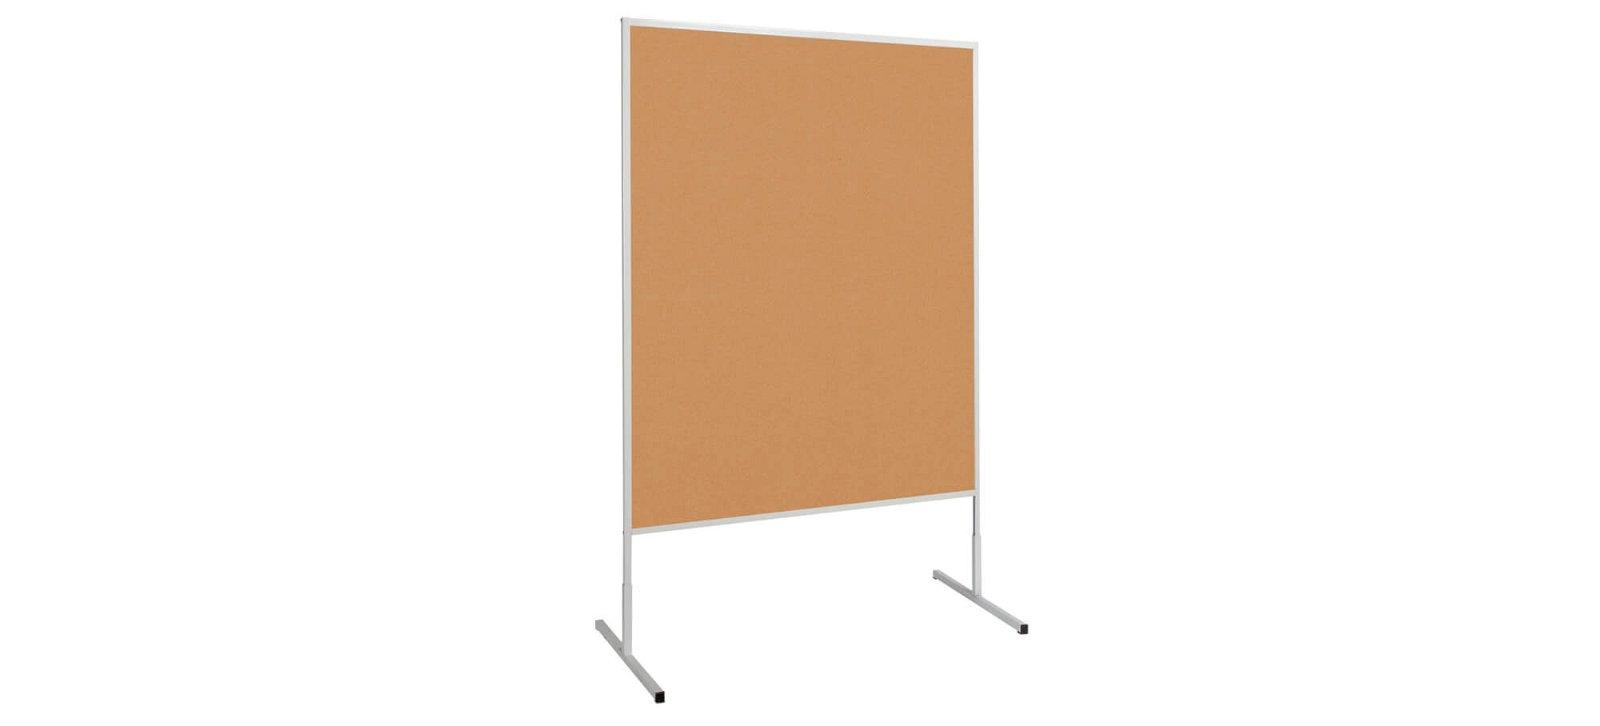 Moderationstafel MAULstandard Kork, 150x120 cm, grau